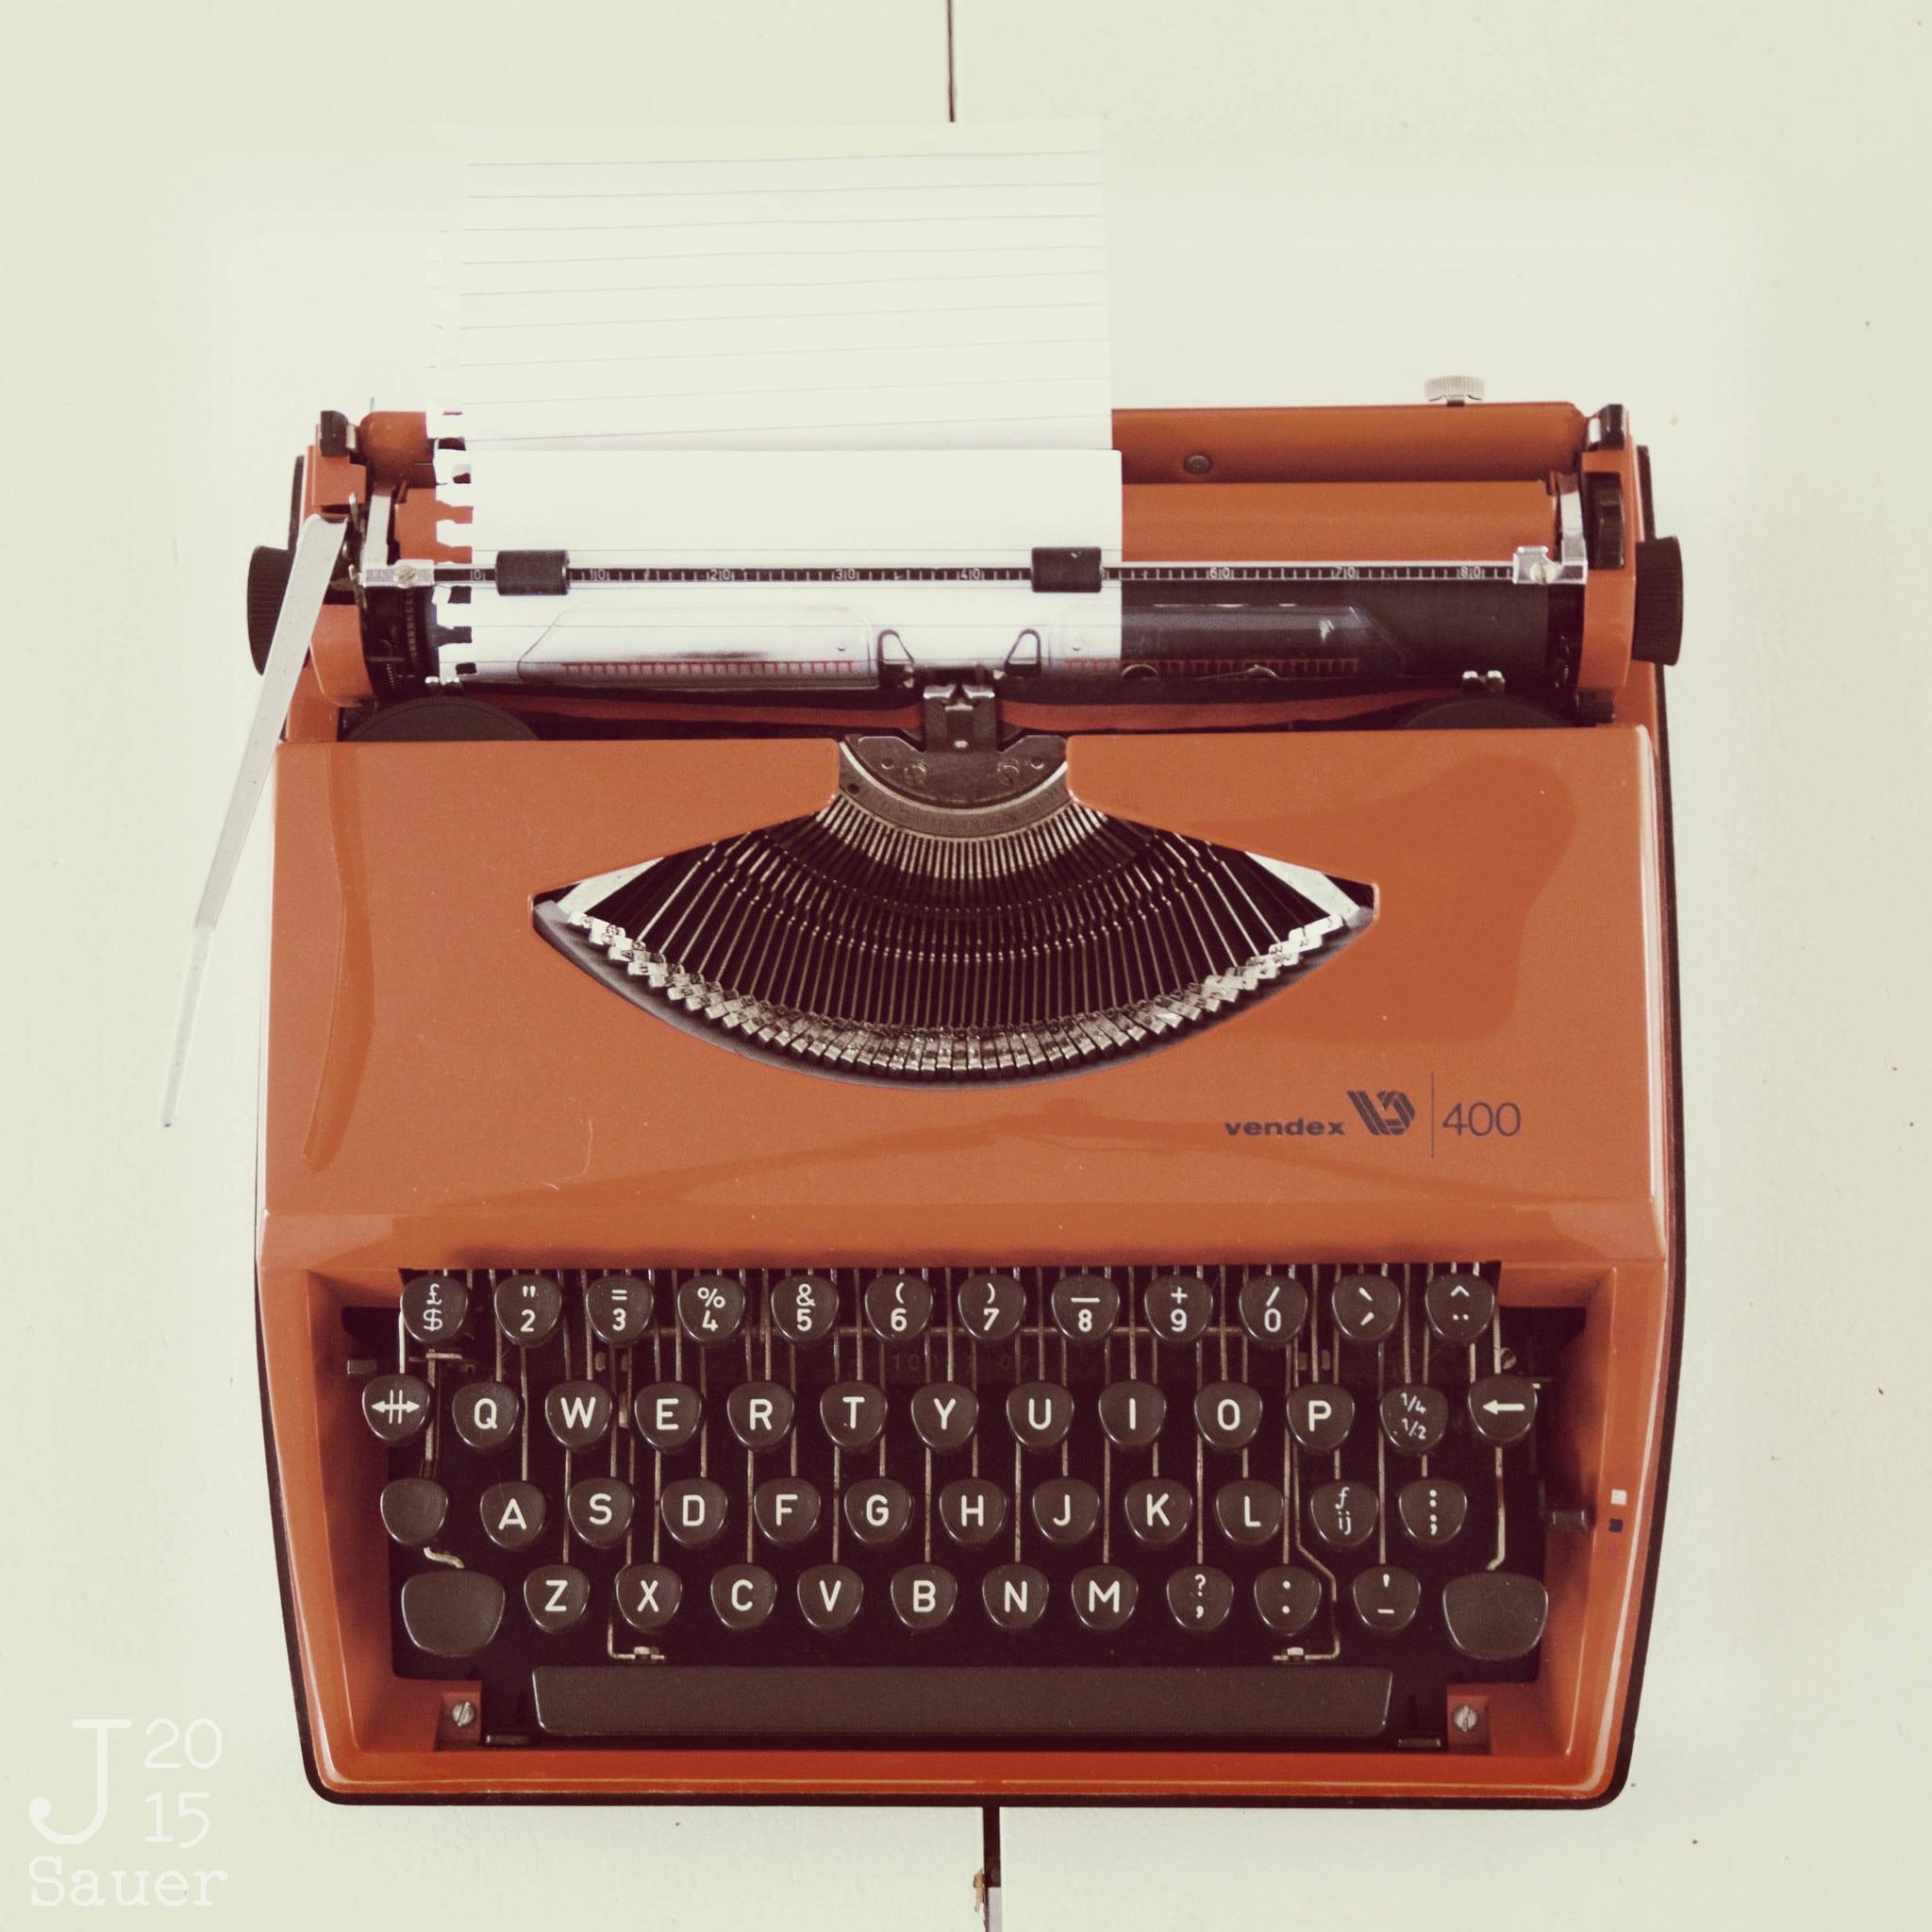 Tekstbureau 't Kofschaap retro typmachine lomo